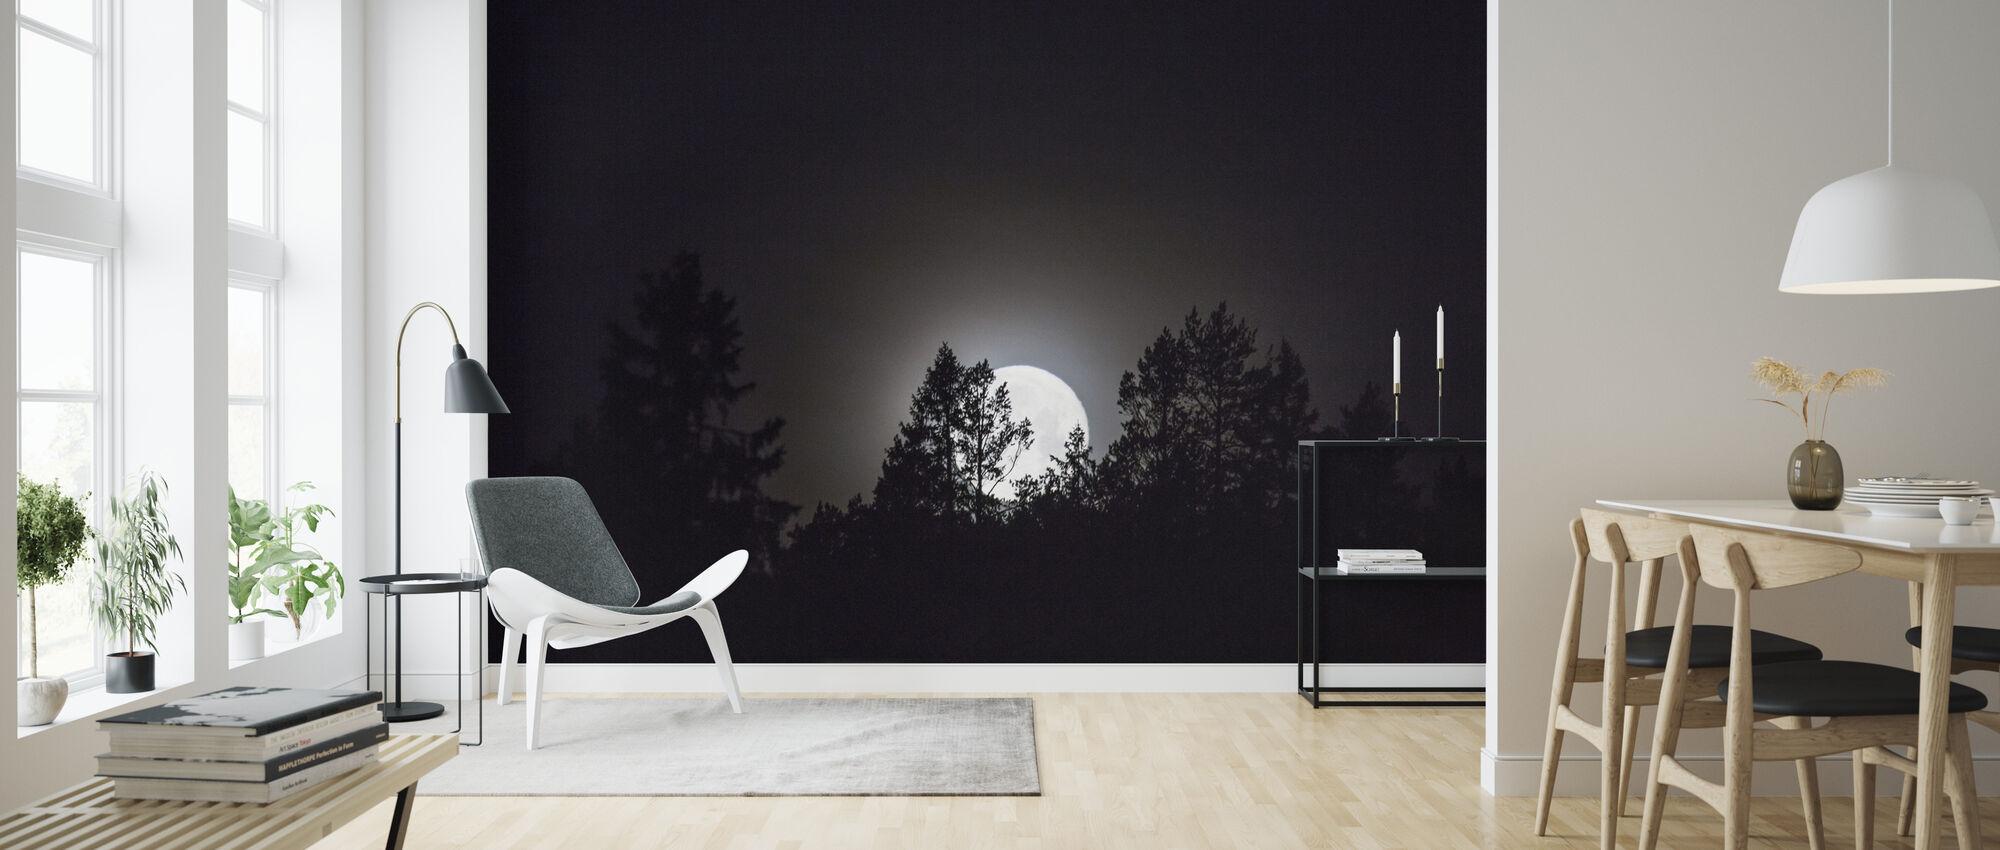 Måneskin over Medelpad, Sverige, Europa - Tapet - Stue